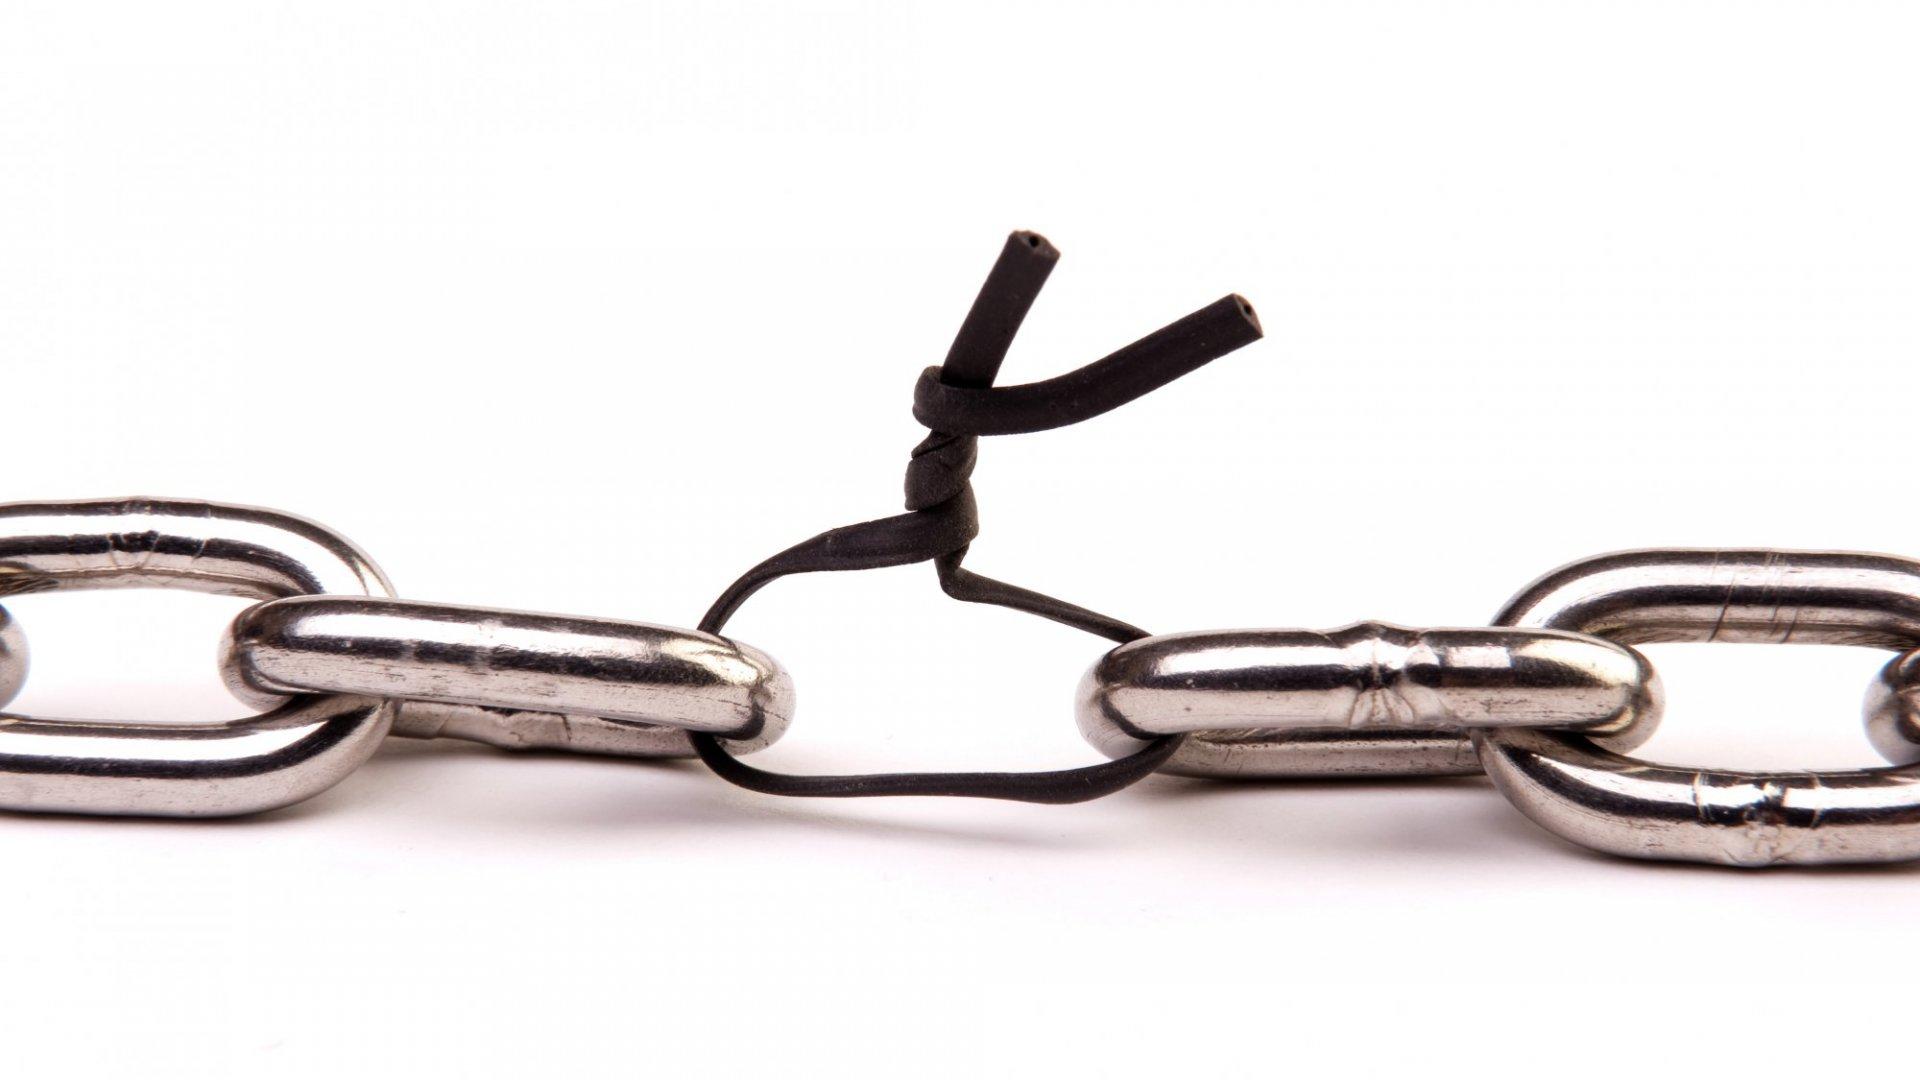 These 4 Strategies Will Make You Immune to Cyberattacks